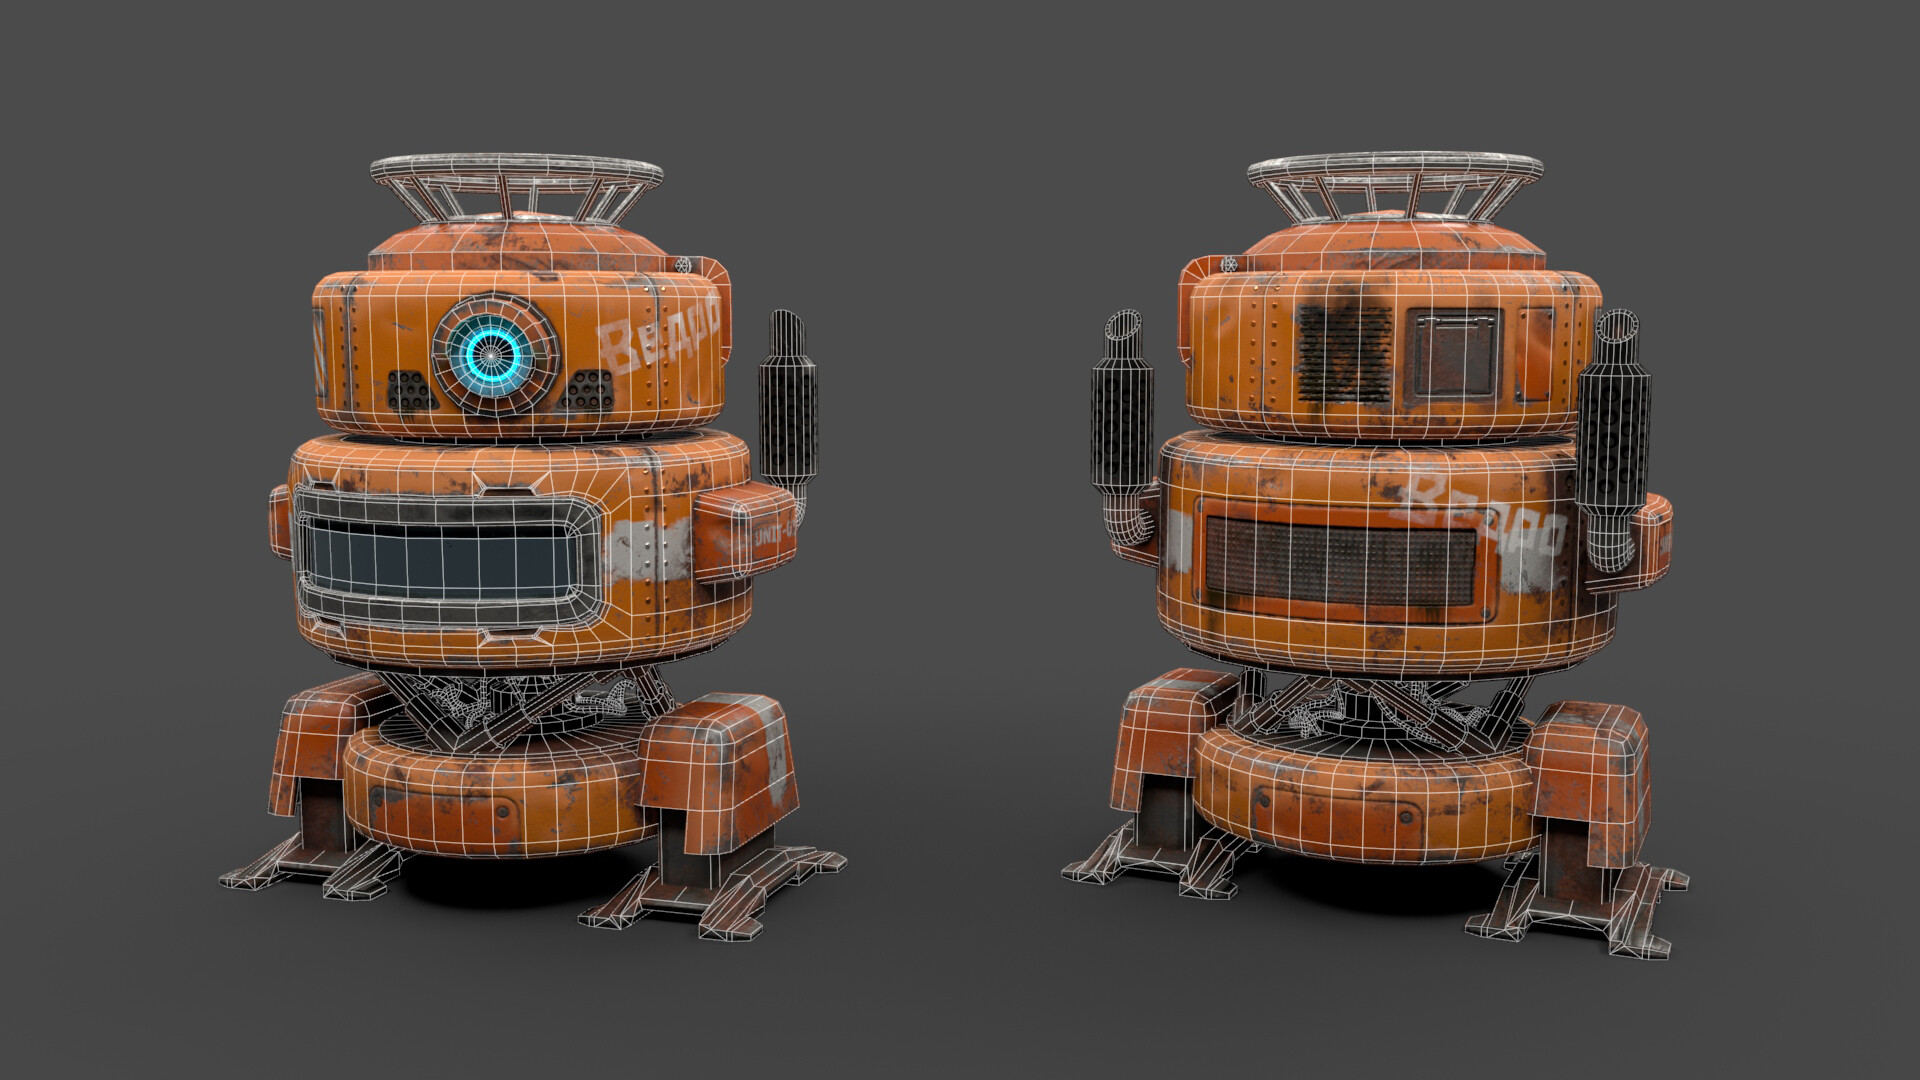 Iain gillespie quarrybot 02 w2